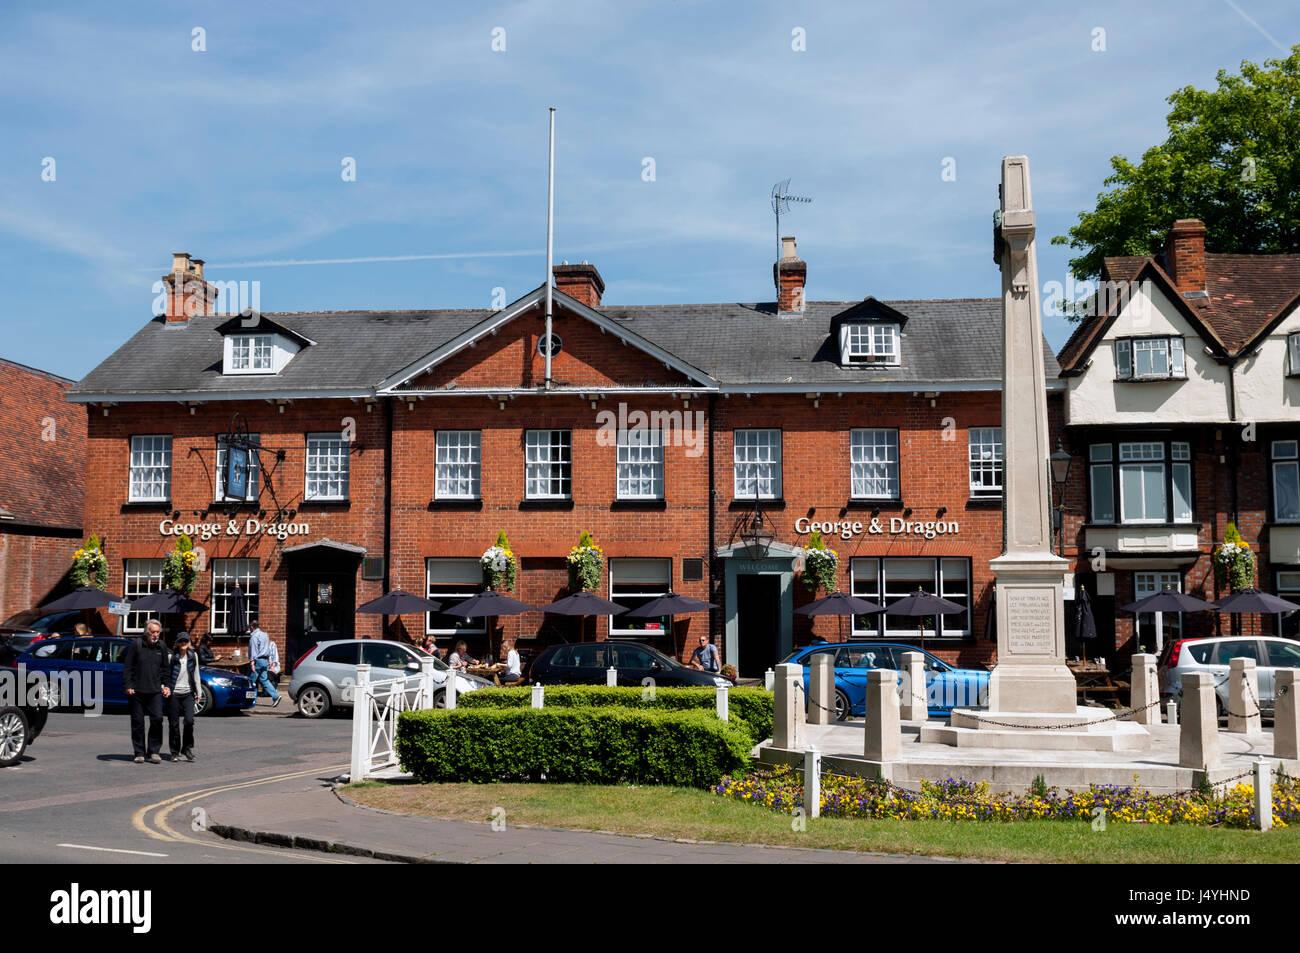 George and Dragon pub, Marlow, Buckinghamshire, England, UK Stock Photo